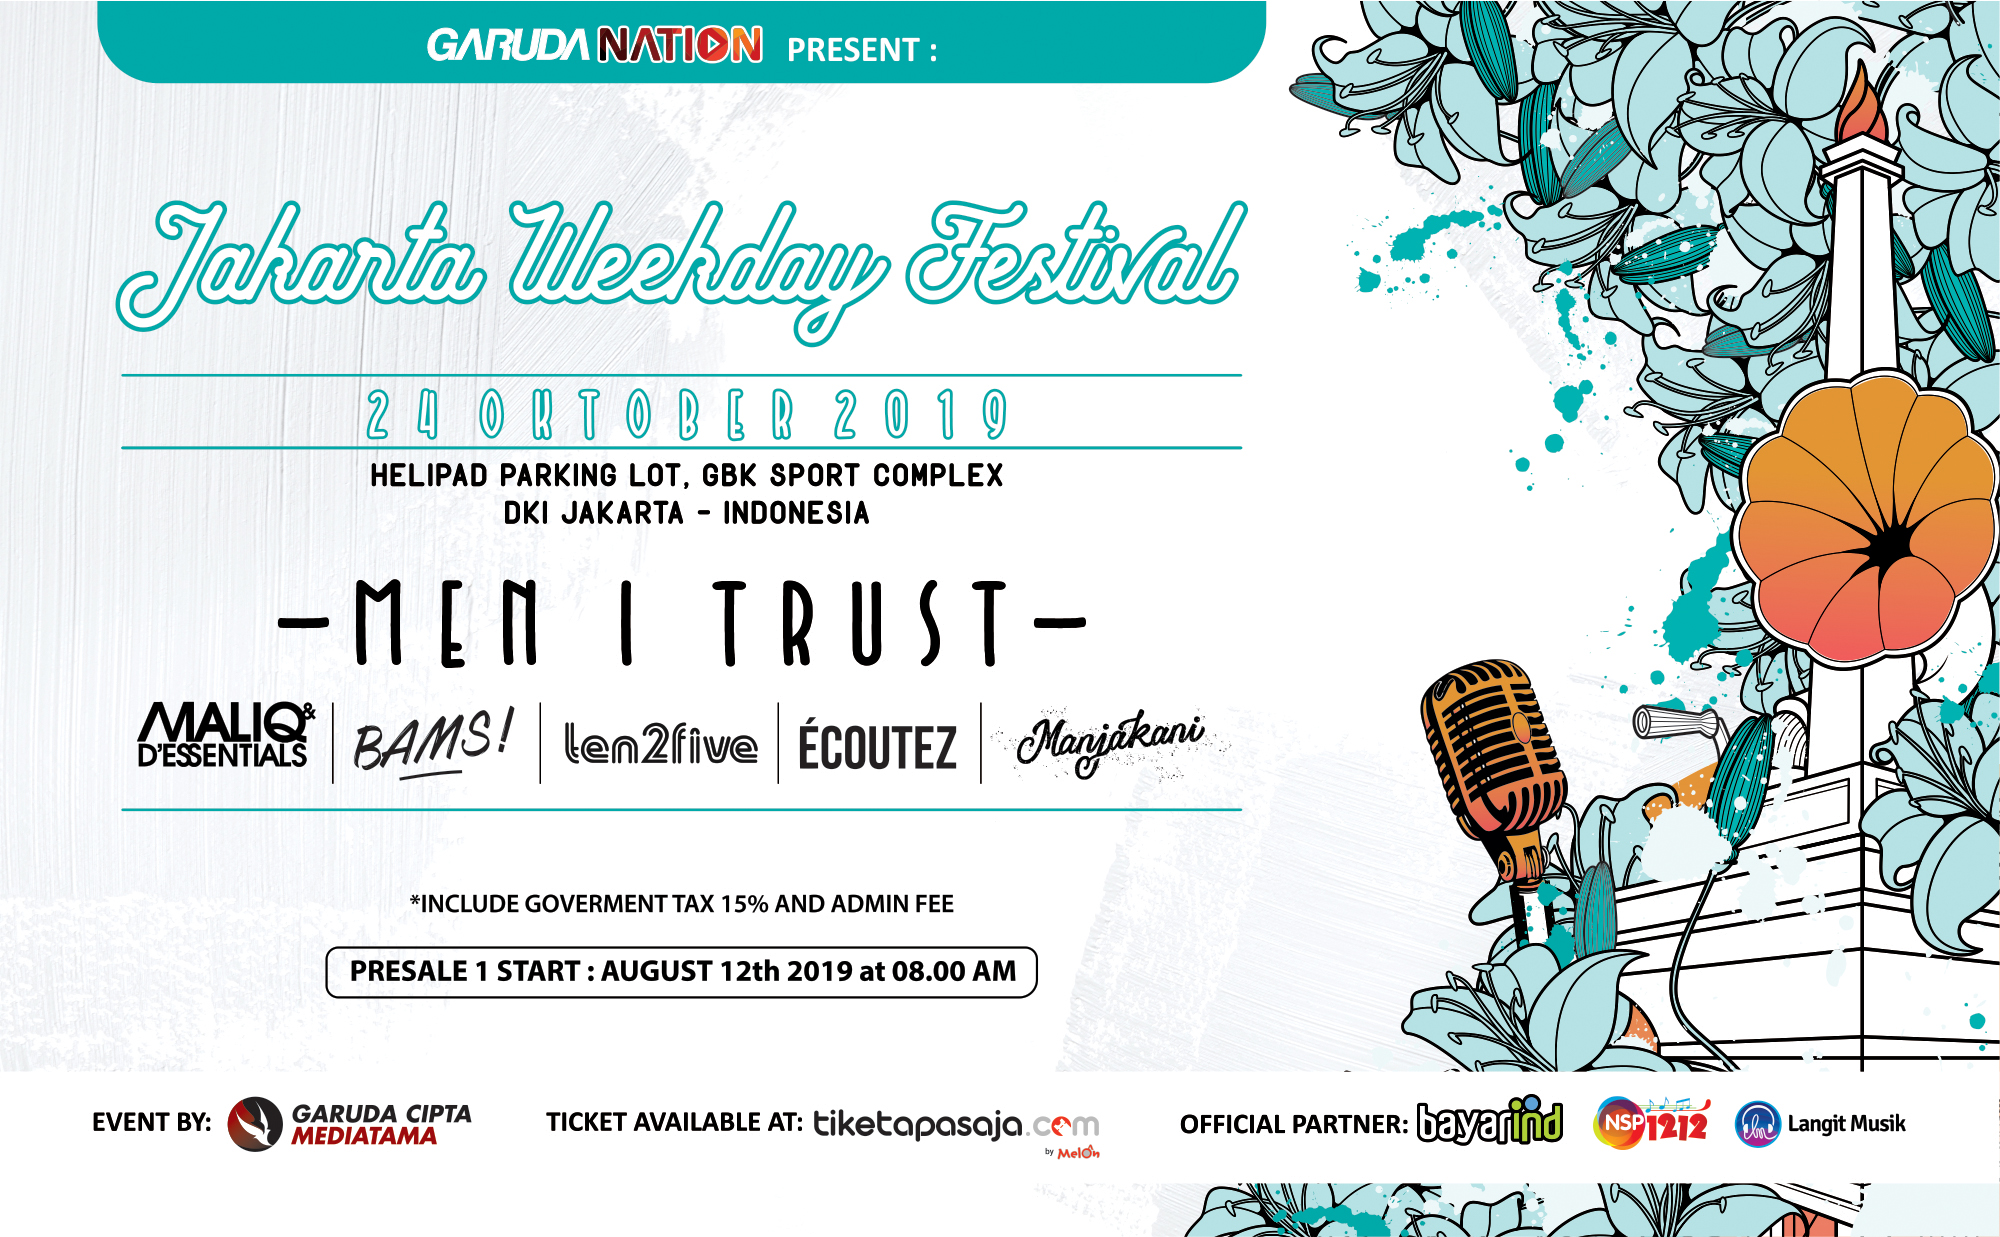 Jakarta Weekday Festival